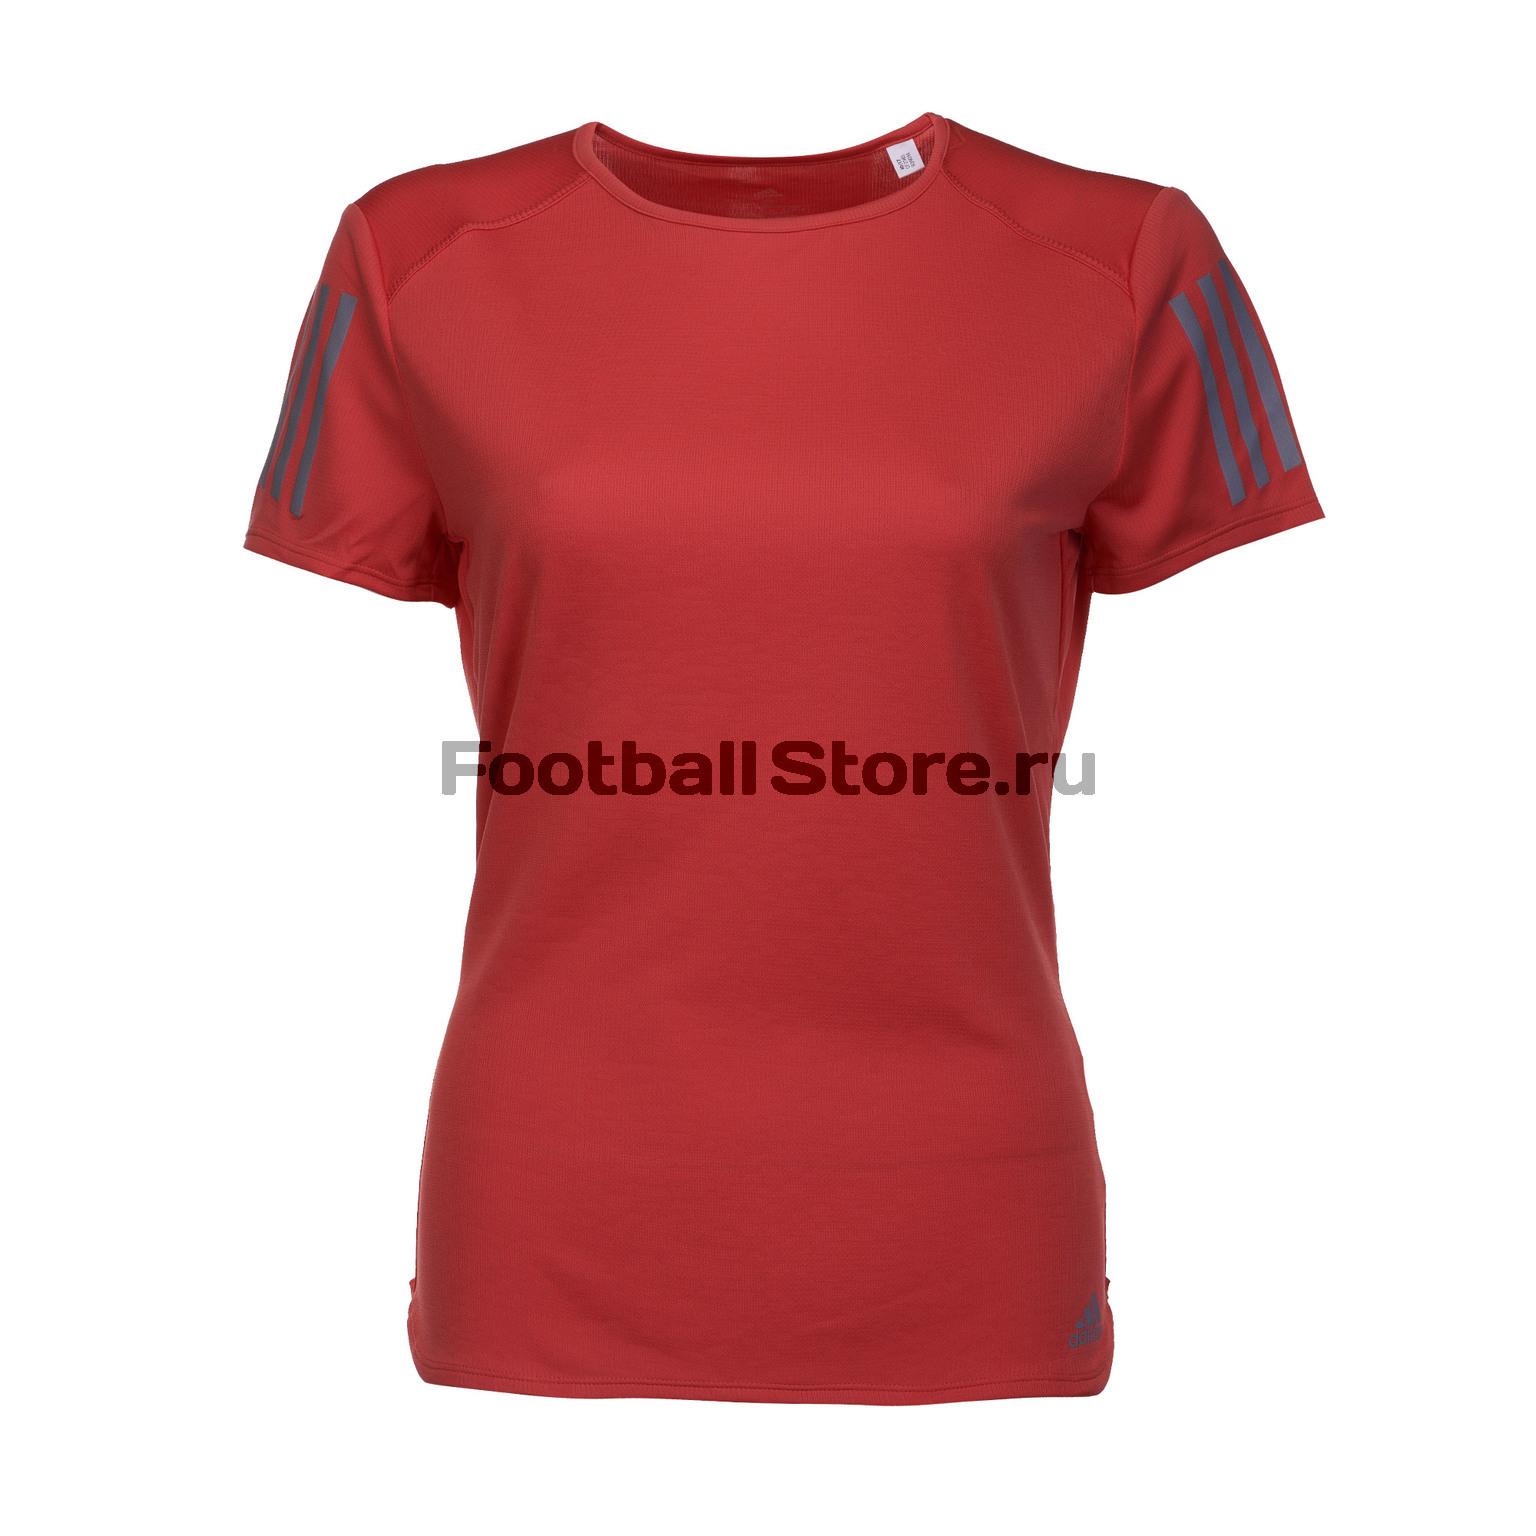 Футболка женская Adidas Russia SS Tee CF2140 футболка element made to endure ss r black